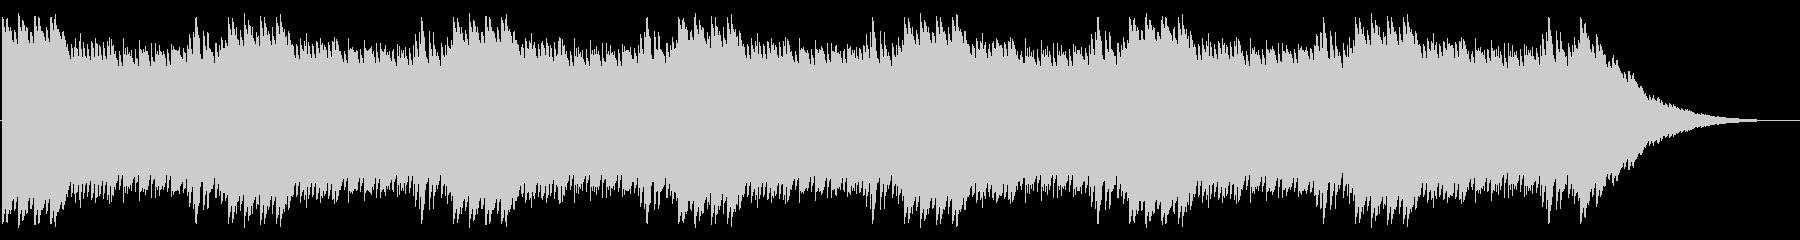 NES STG B03-1(ボス) の未再生の波形